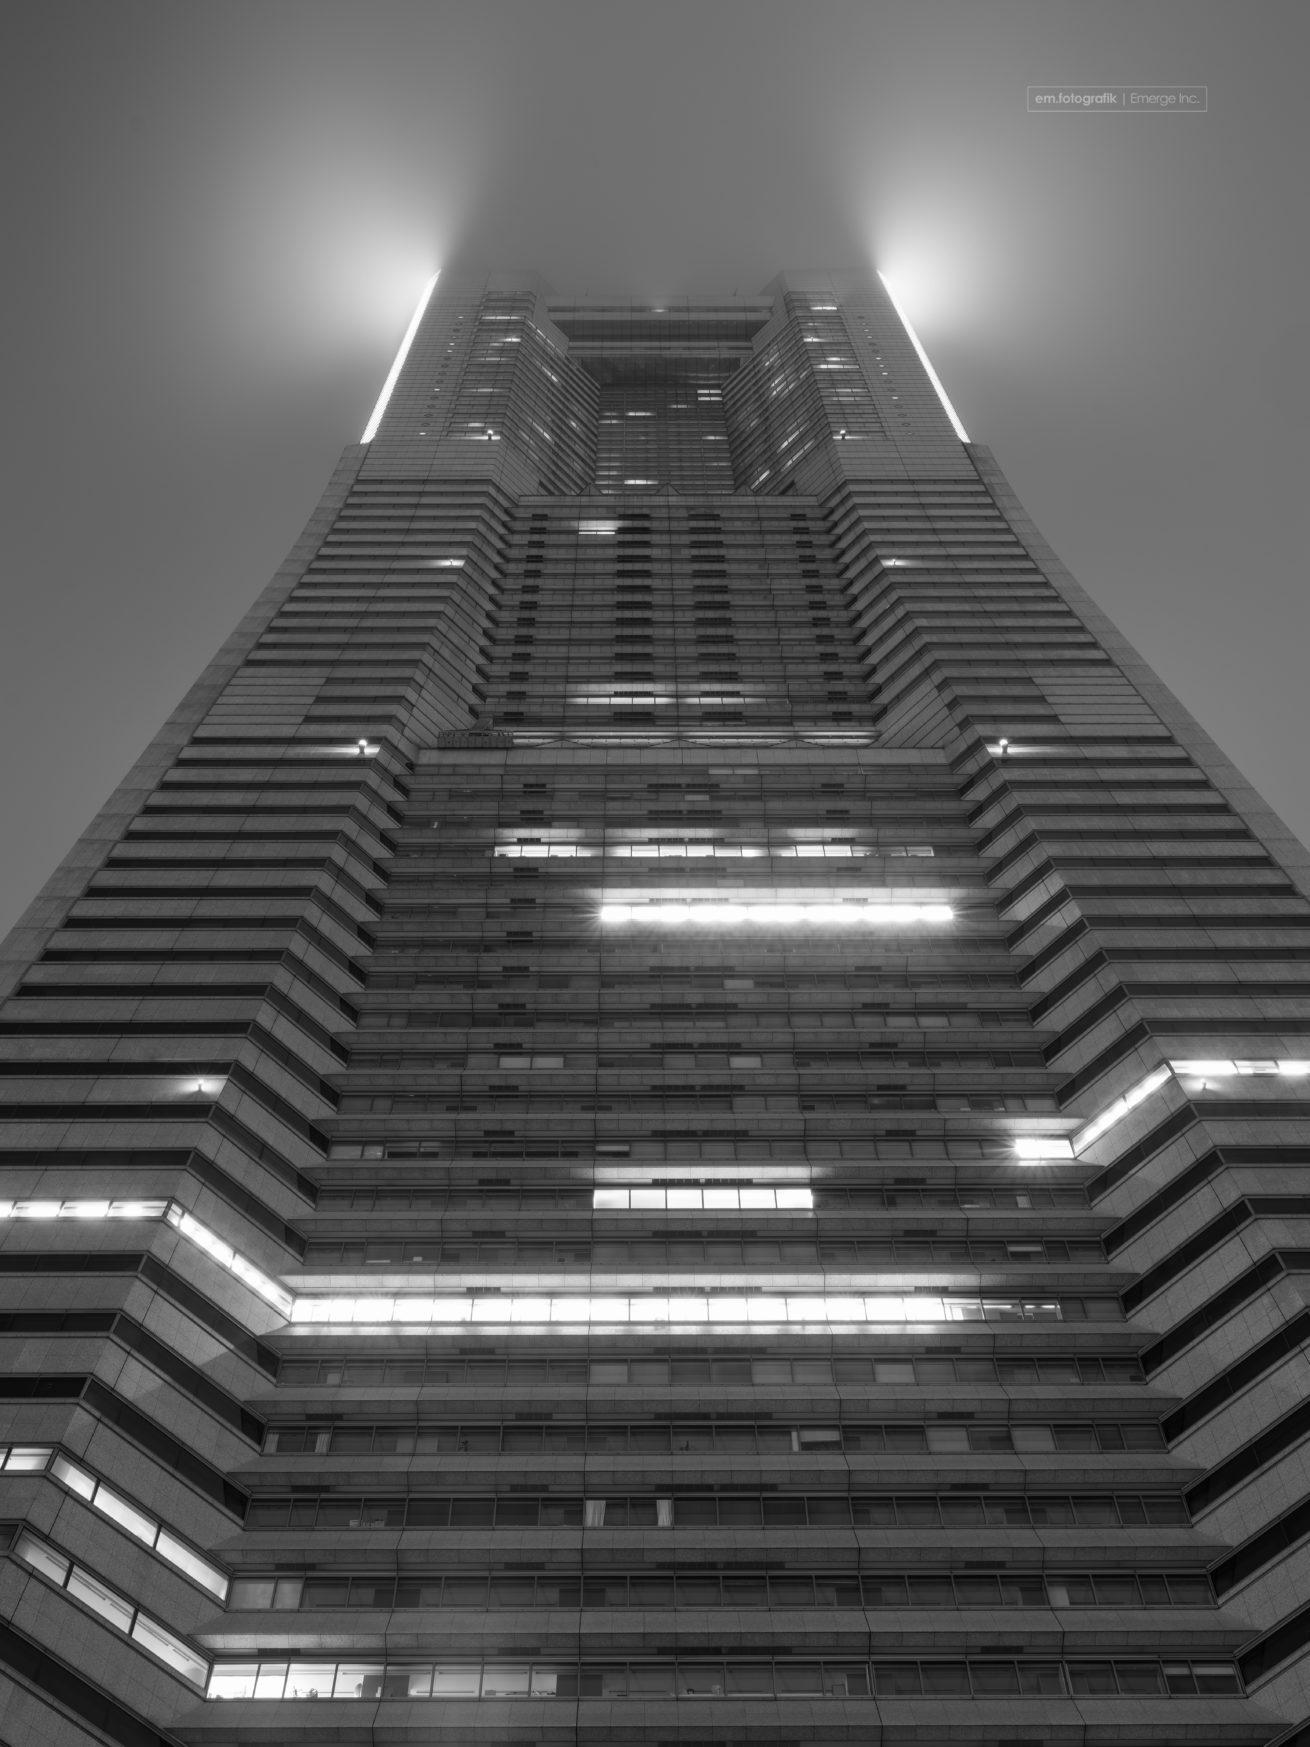 _EM94861-Edit-Landmark-Tower-BW-WM-FULL